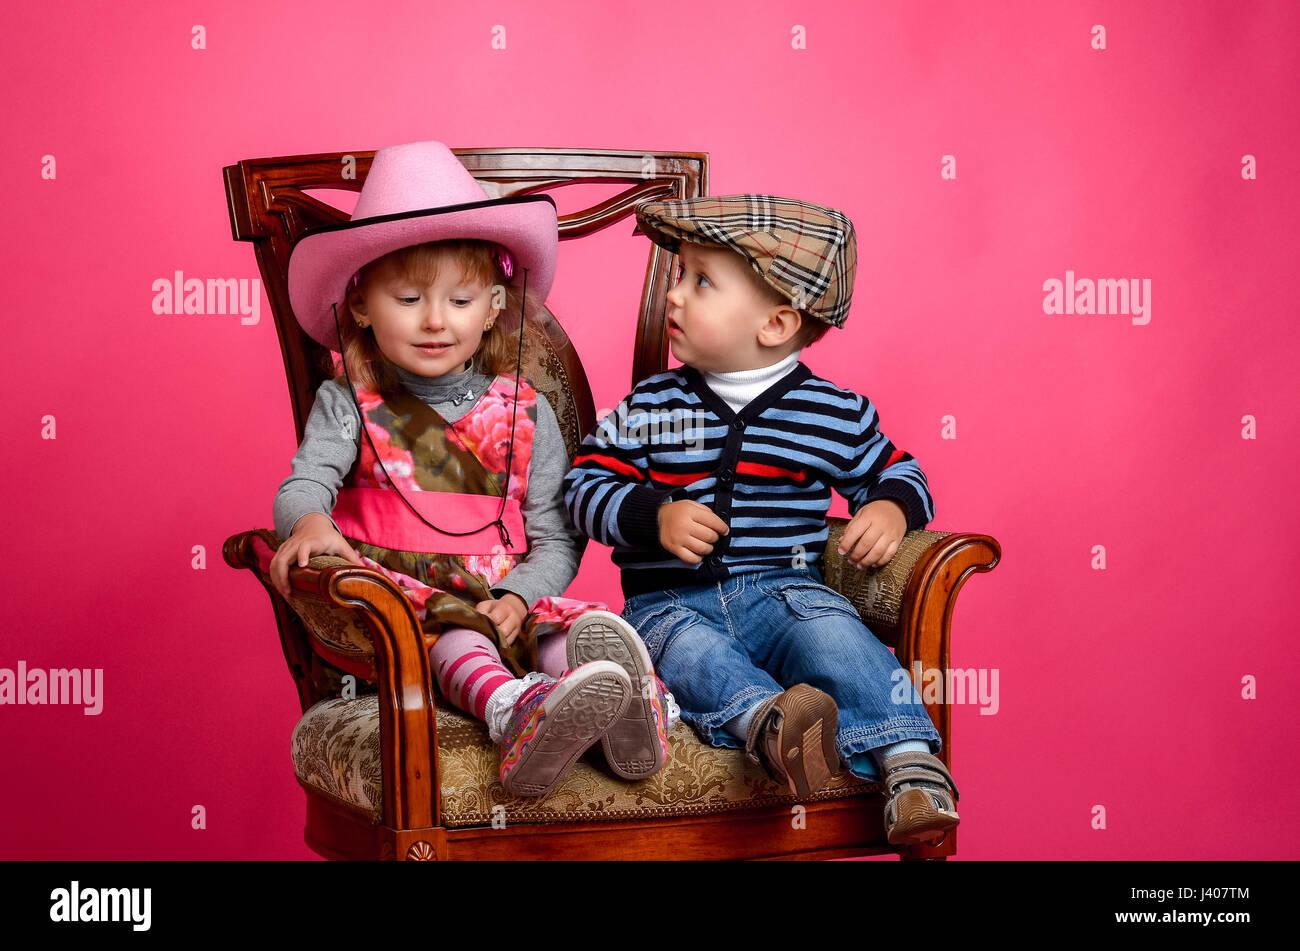 ce70516678b8c two children smiling wearing cowboy hats